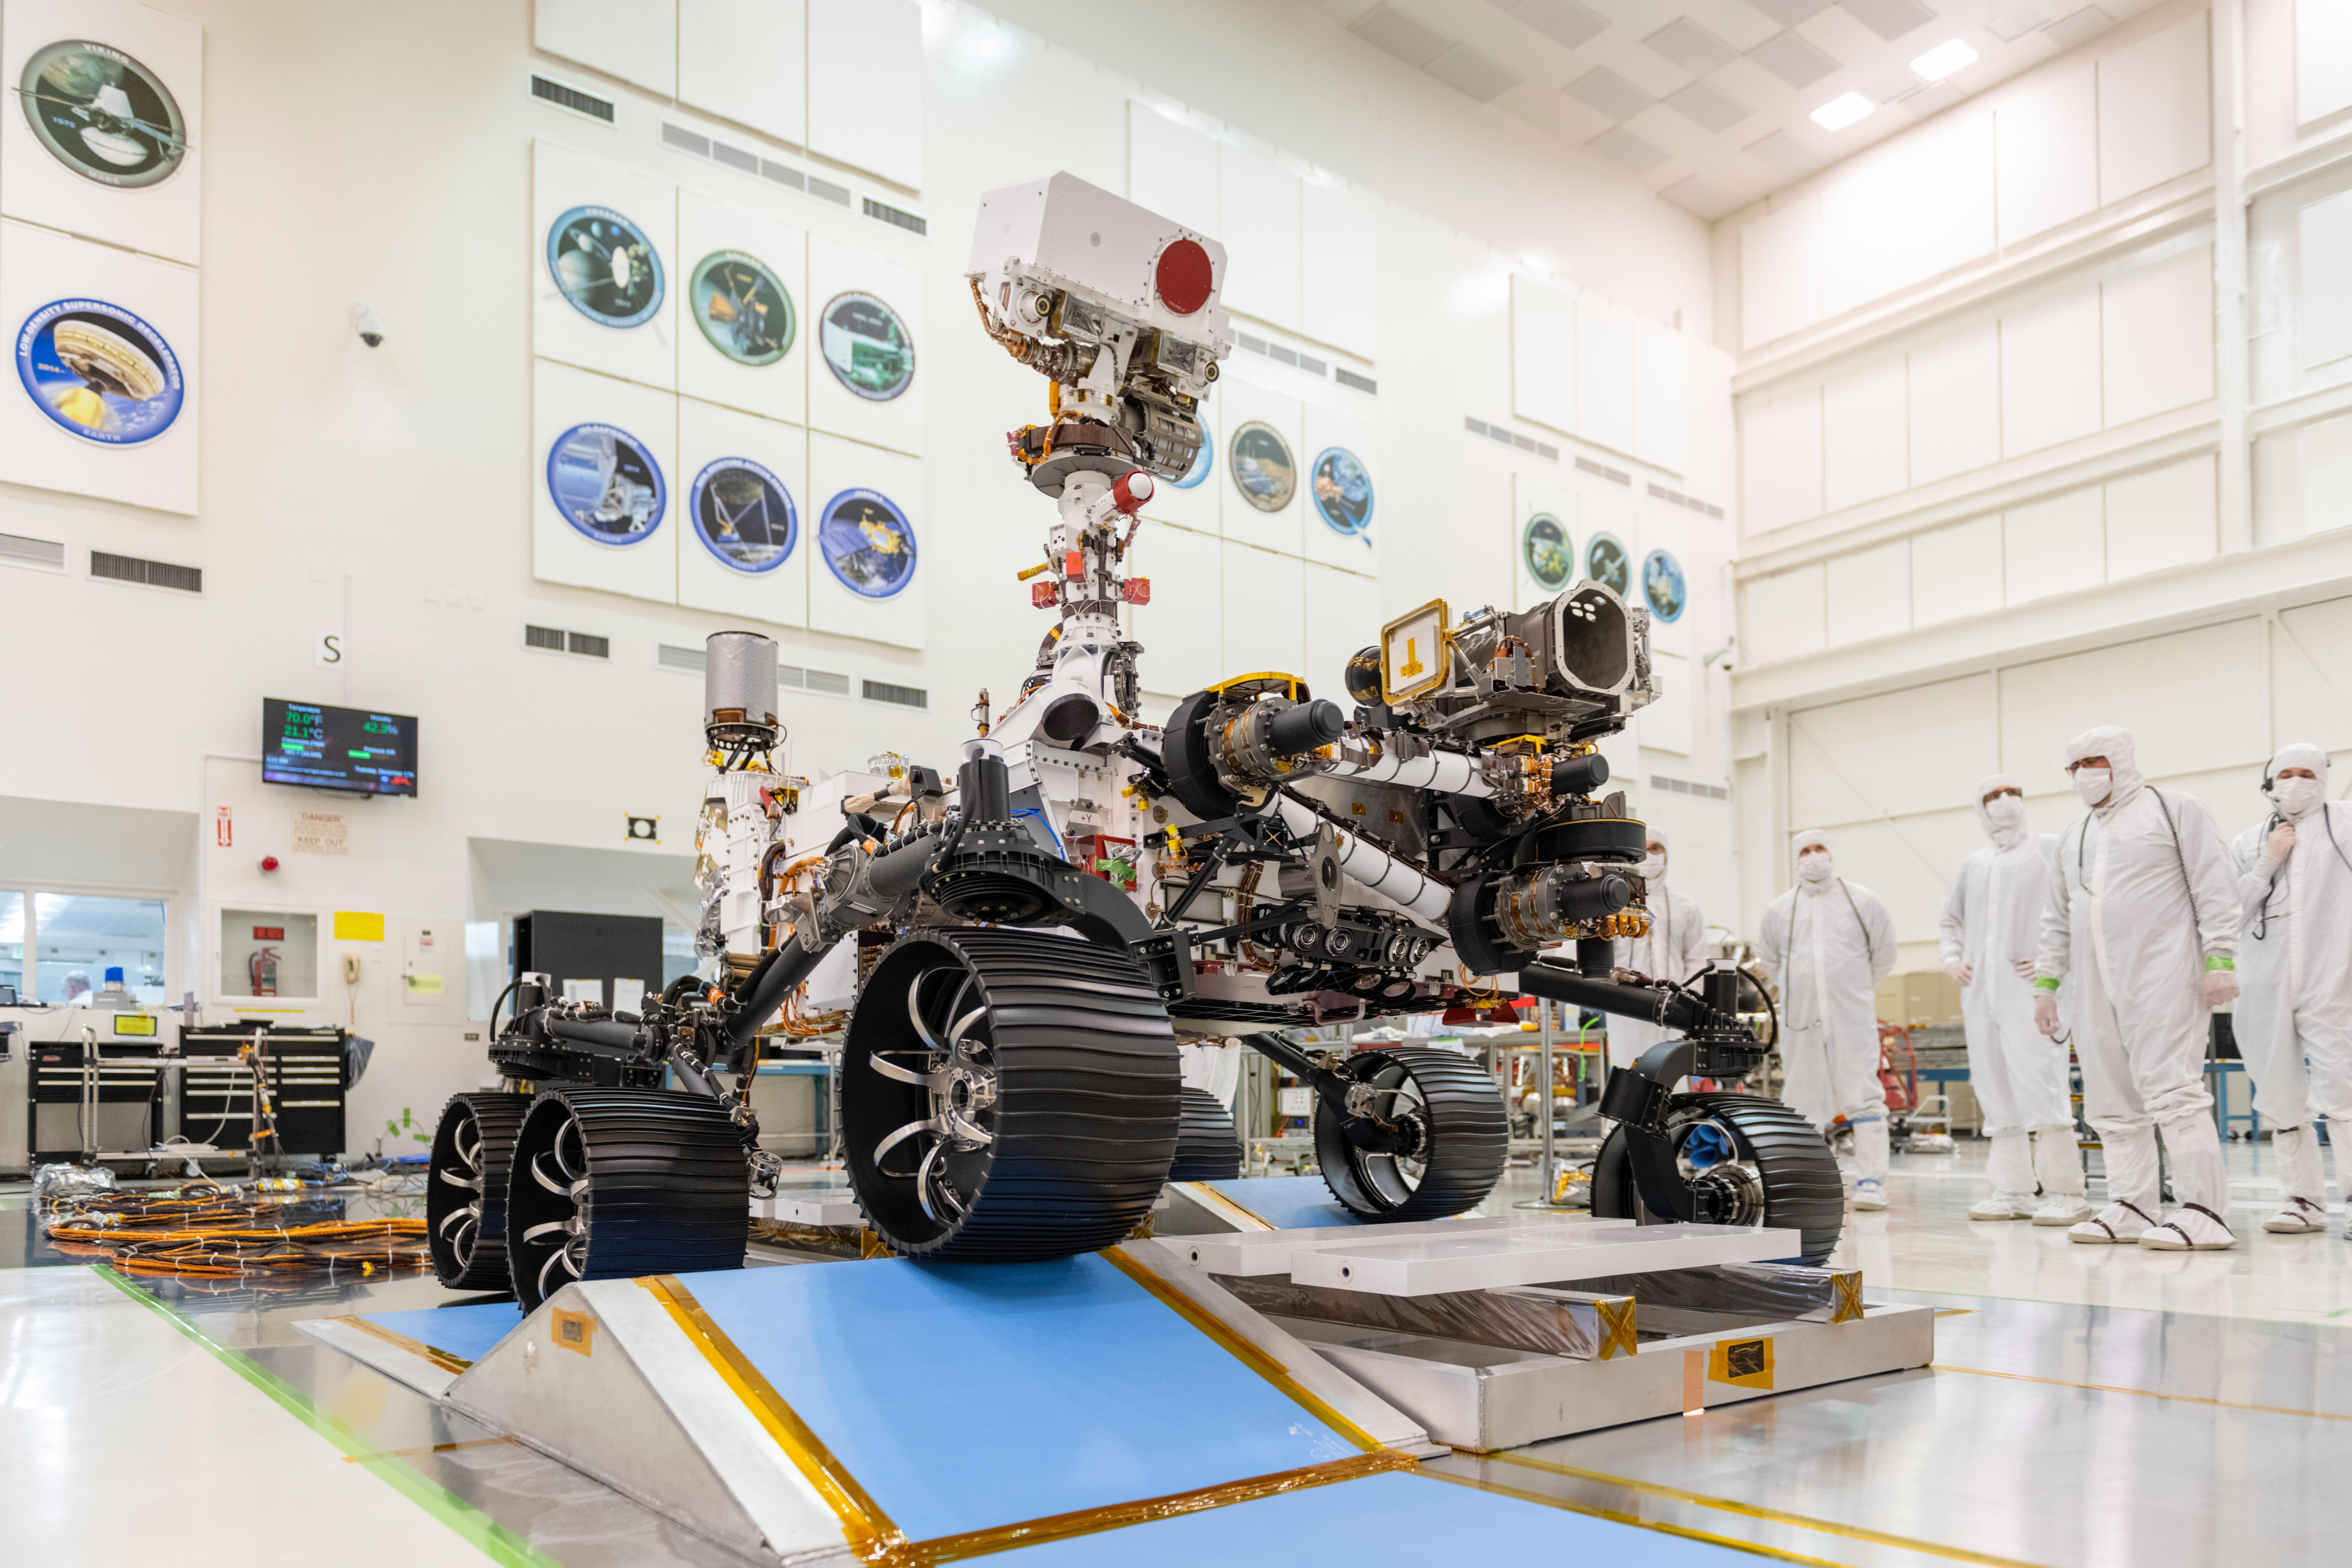 2020 in spaceflight - Wikipedia